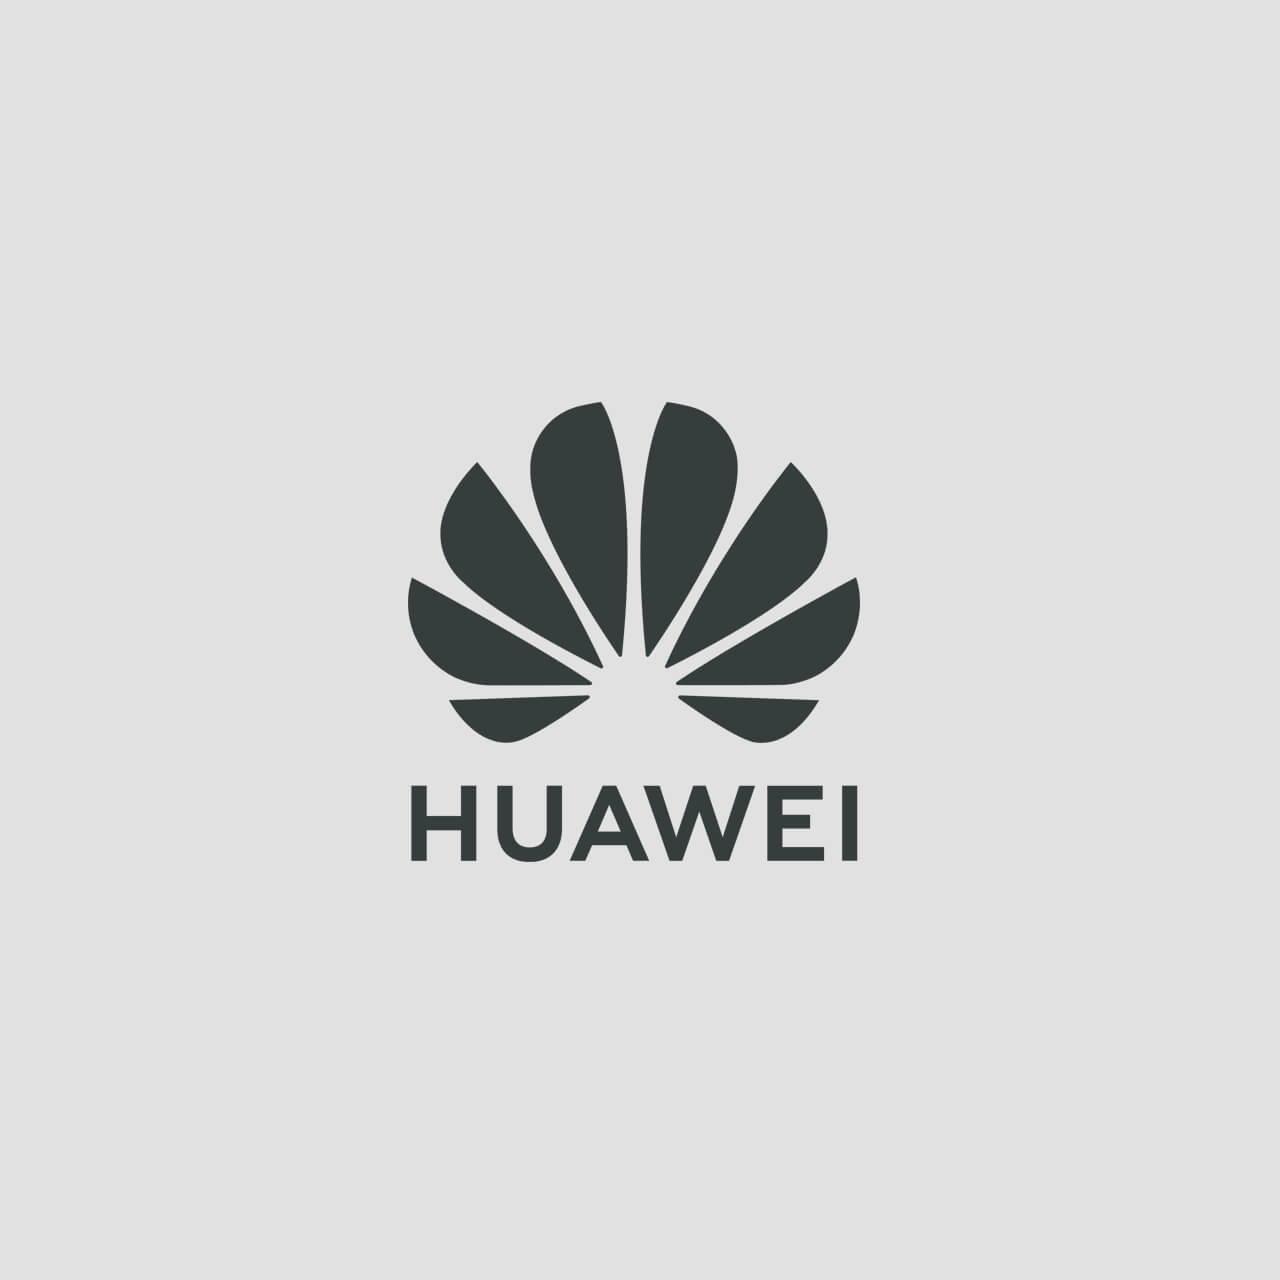 Huawei Phone Skins